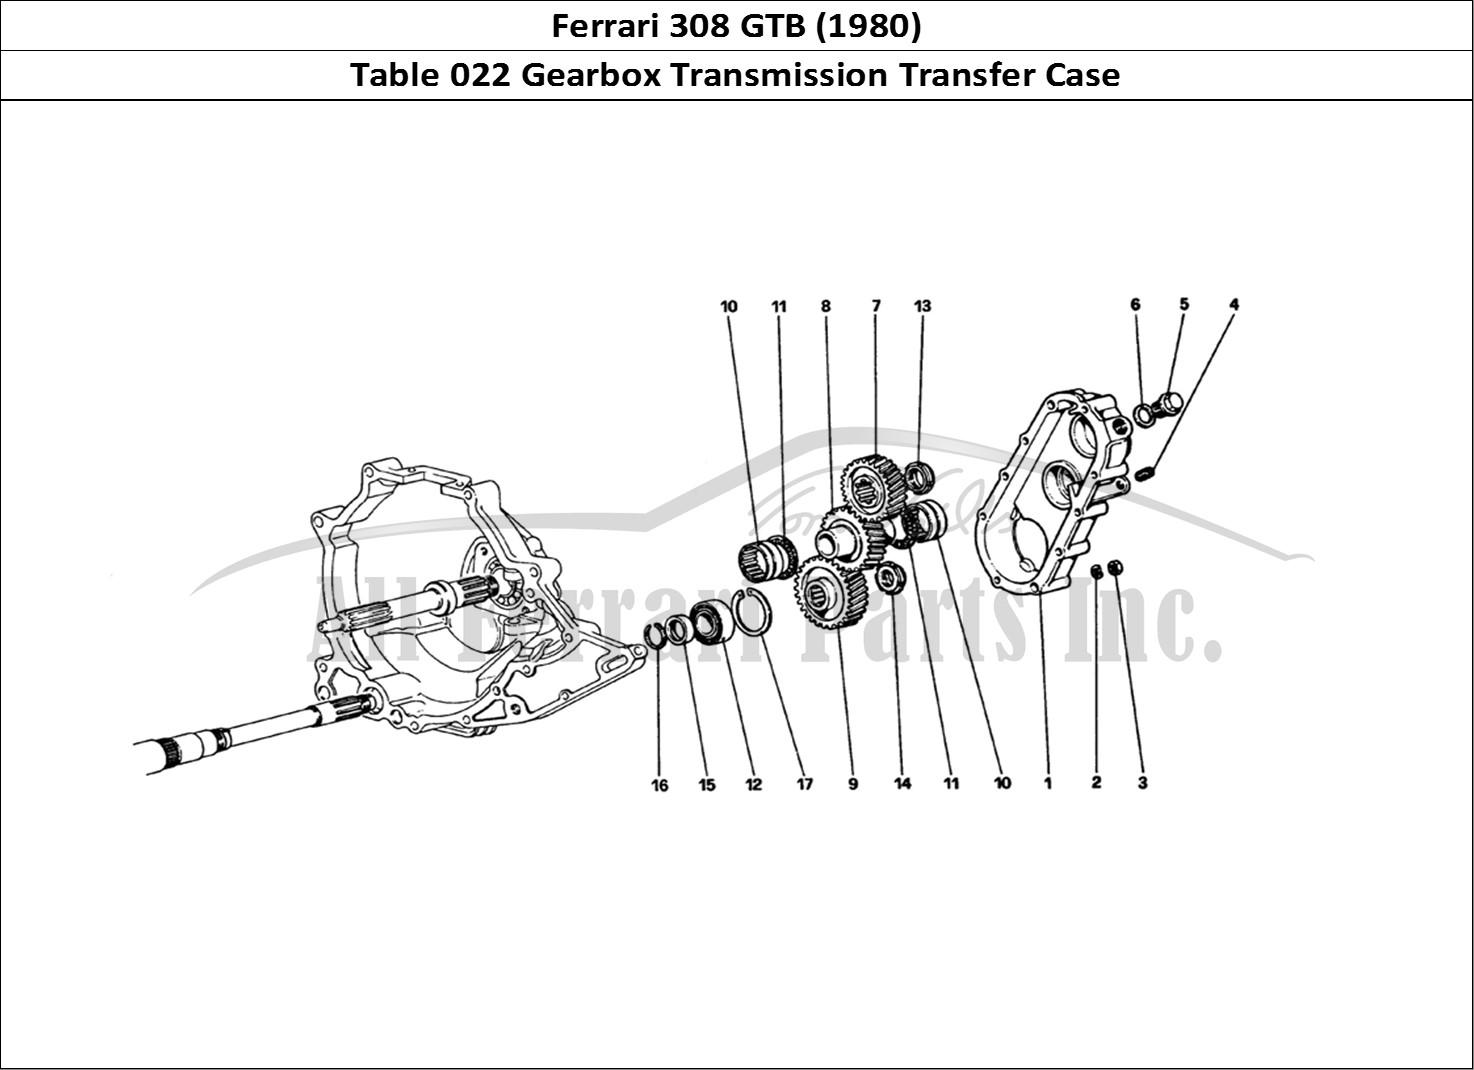 Buy original Ferrari 308 GTB (1980) 022 Gearbox